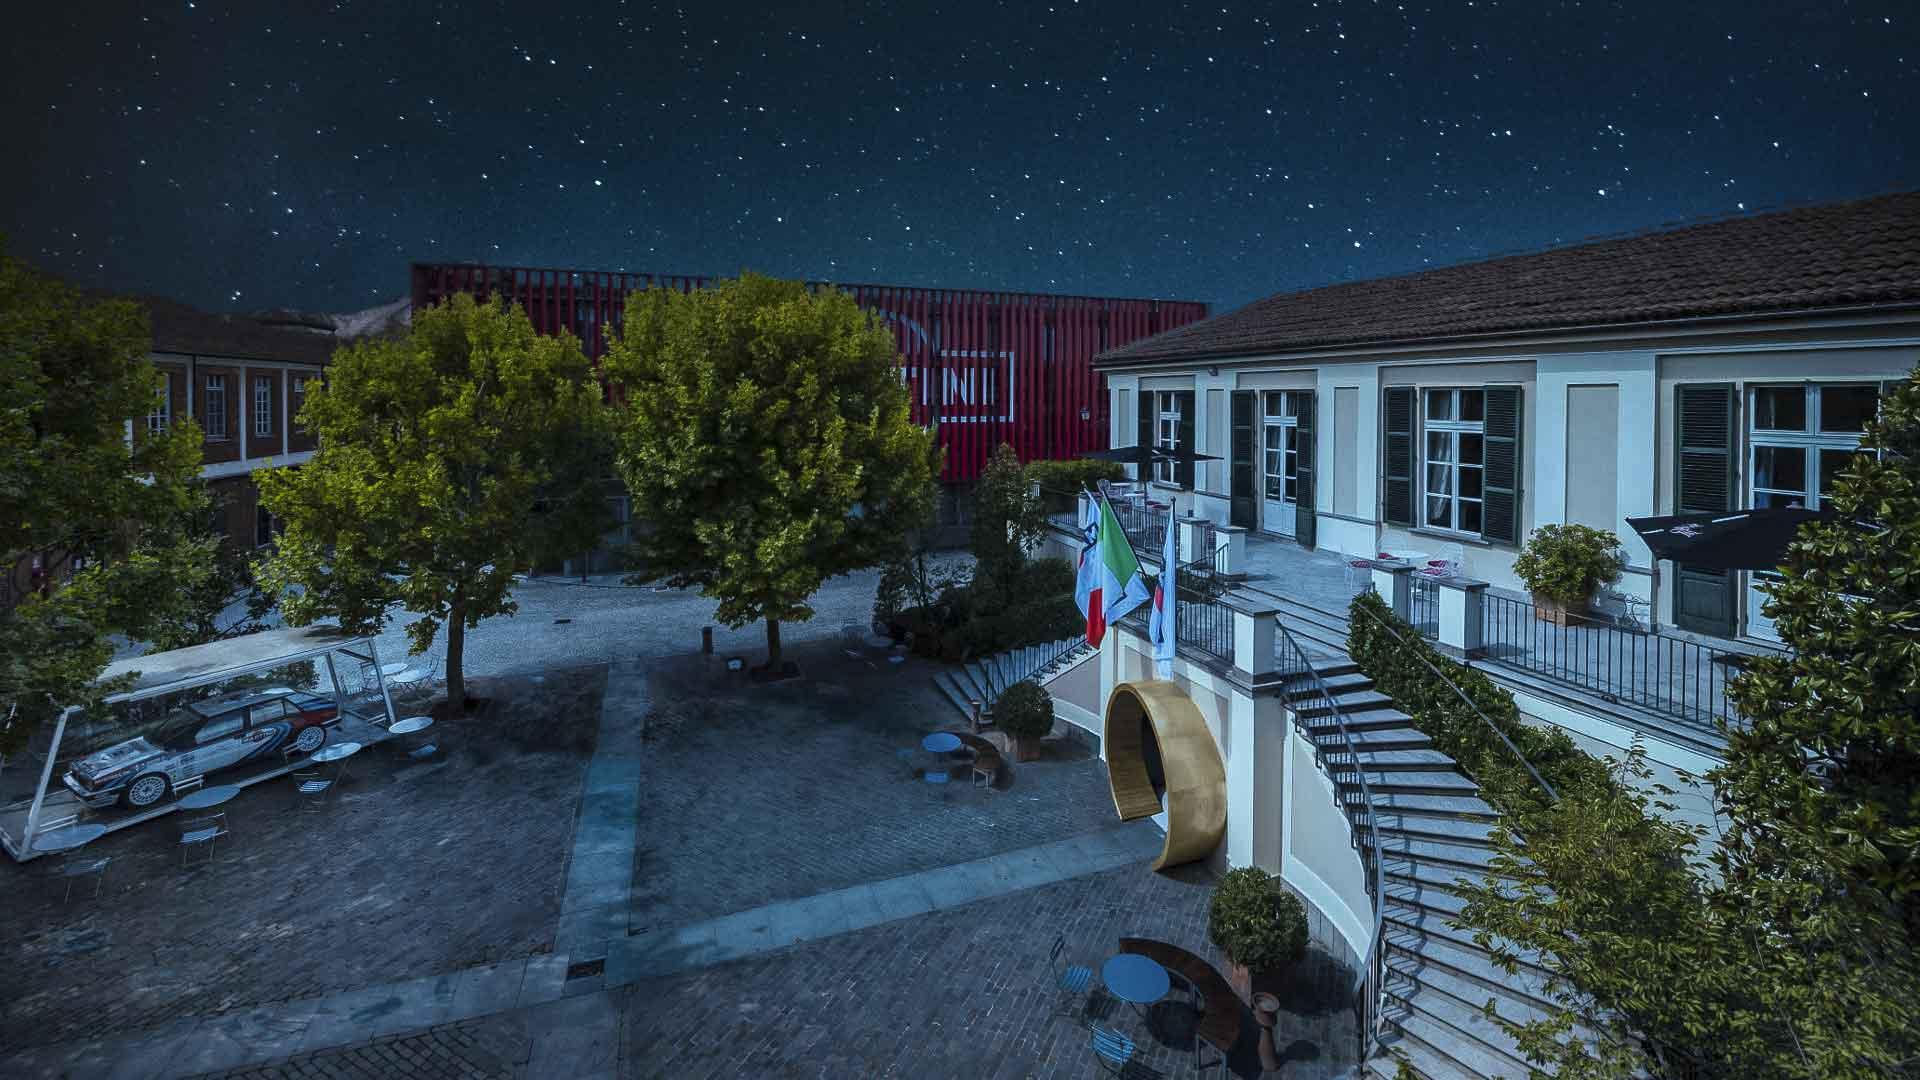 Una notte a Casa Martini / Music, food & drink